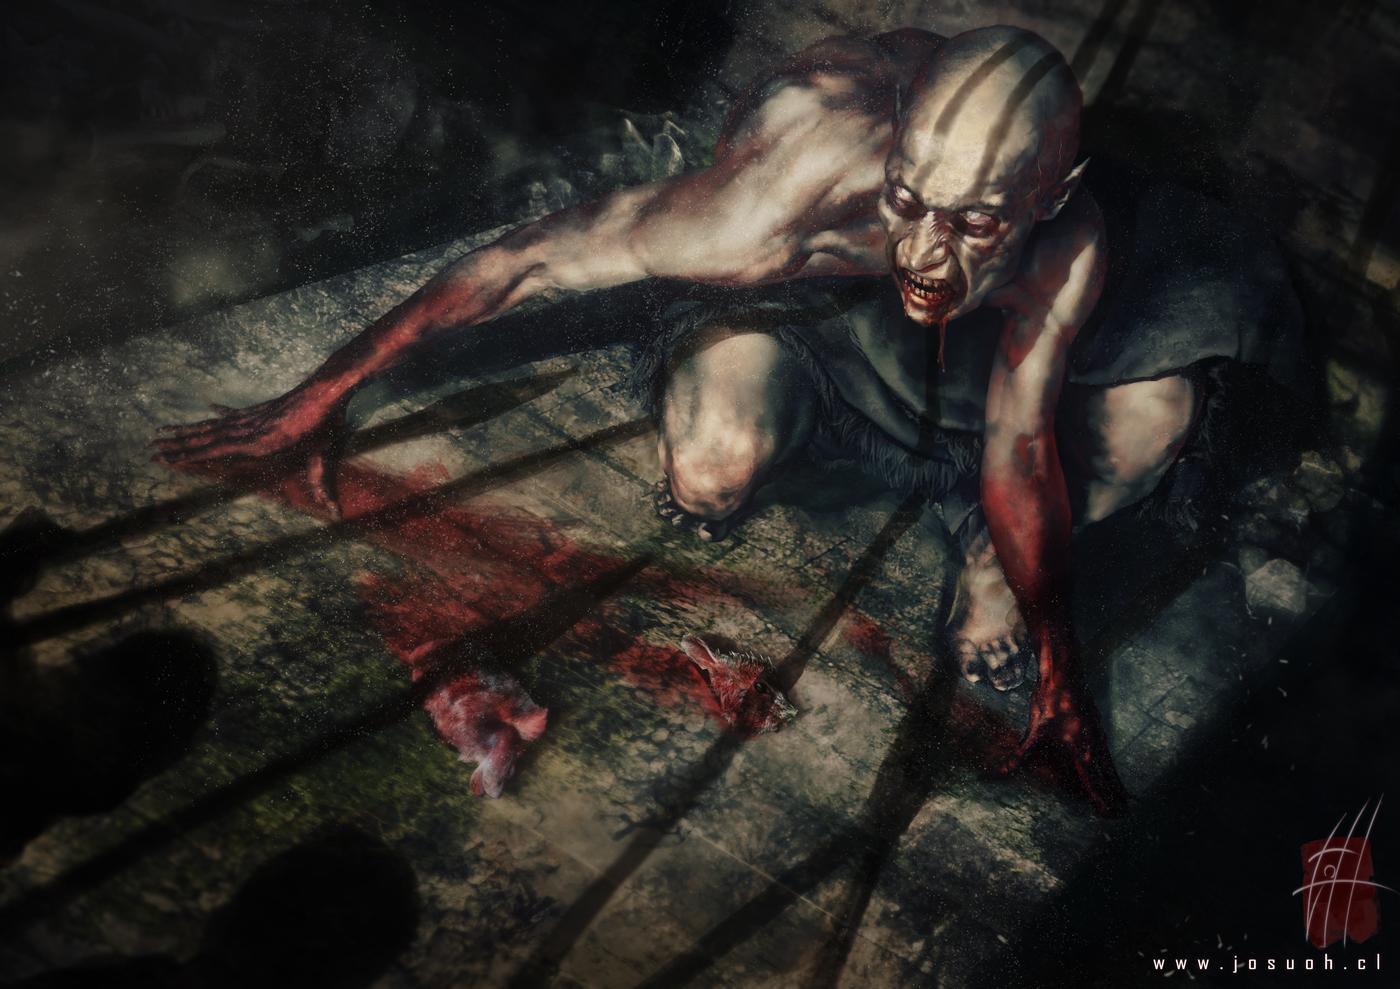 hunted_ghoul_by_robotdelespacio-d7602s9.jpg